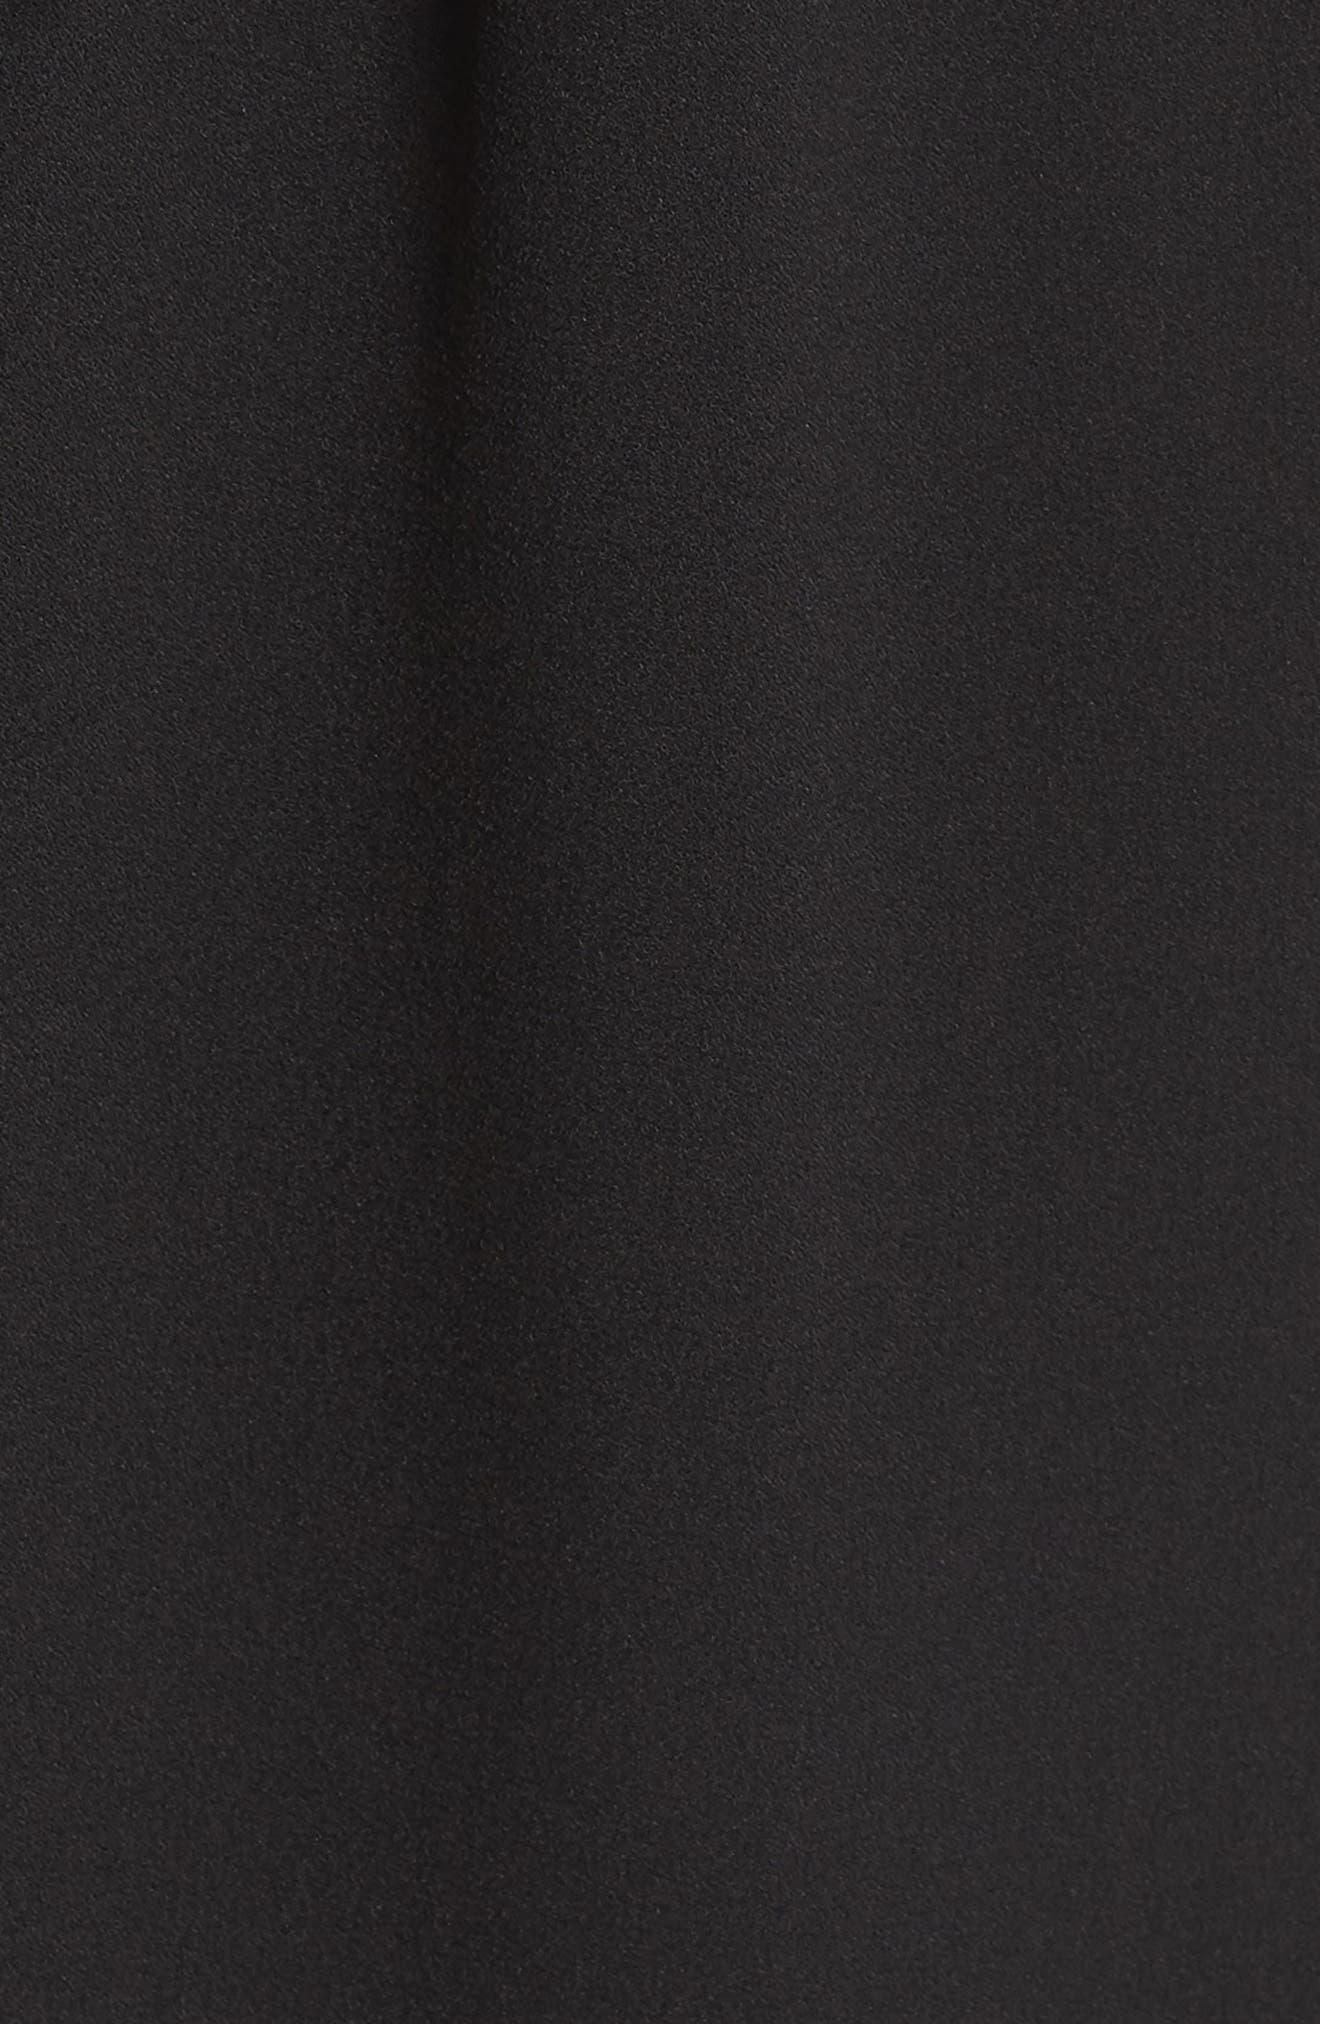 Tie Front Sheath Dress,                             Alternate thumbnail 6, color,                             001